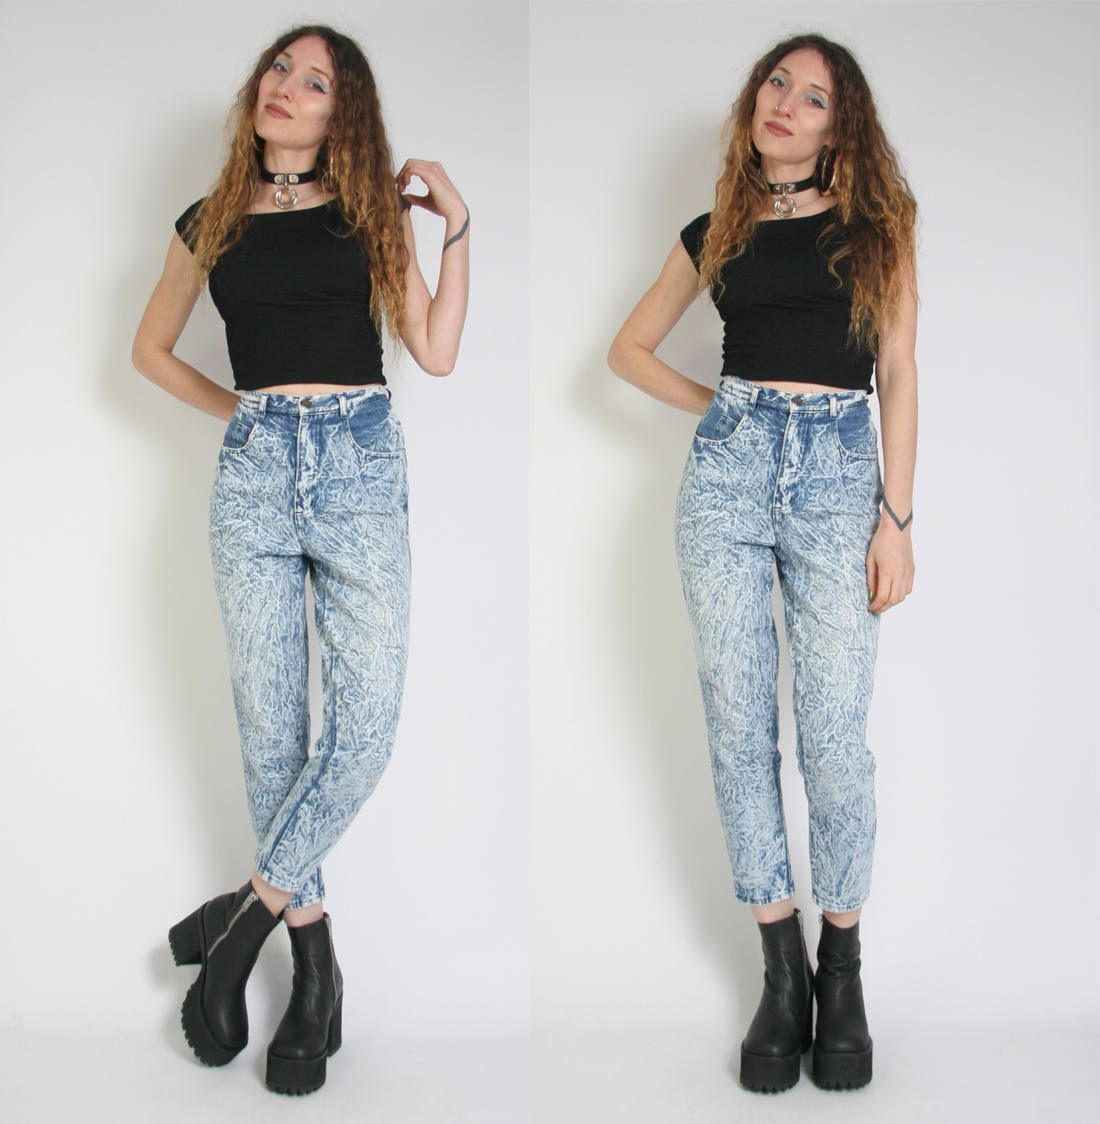 Vintage 90s Acid Wash Jeans - Mom Jeans - High Waisted Jeans ...